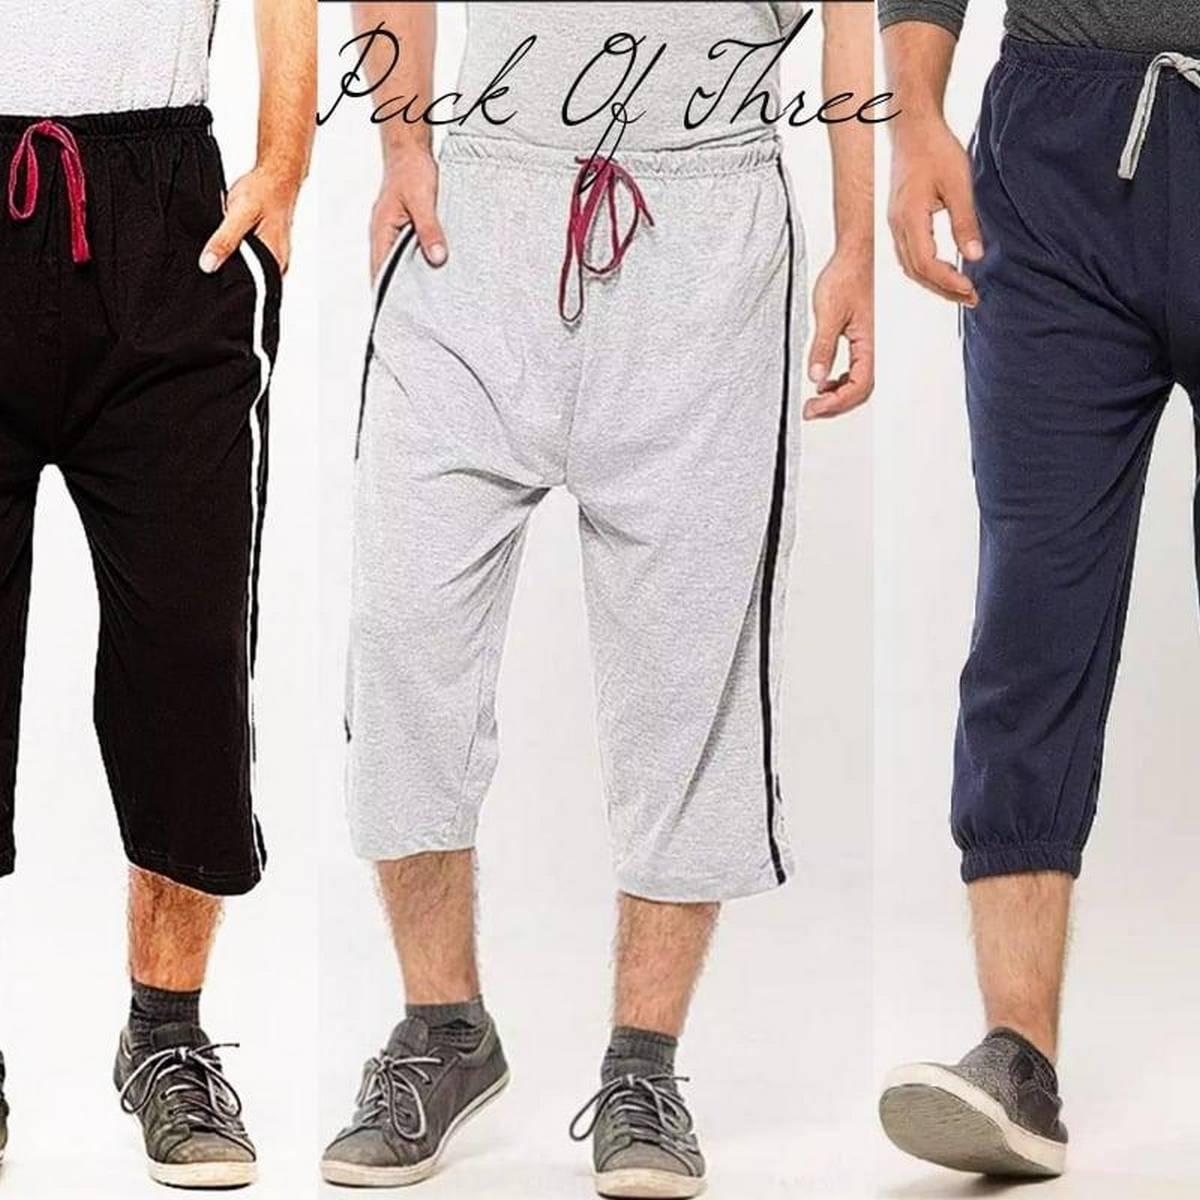 Pack of 3 - Three Quarter Jersey Shorts For Men - Blue, Black, Grey